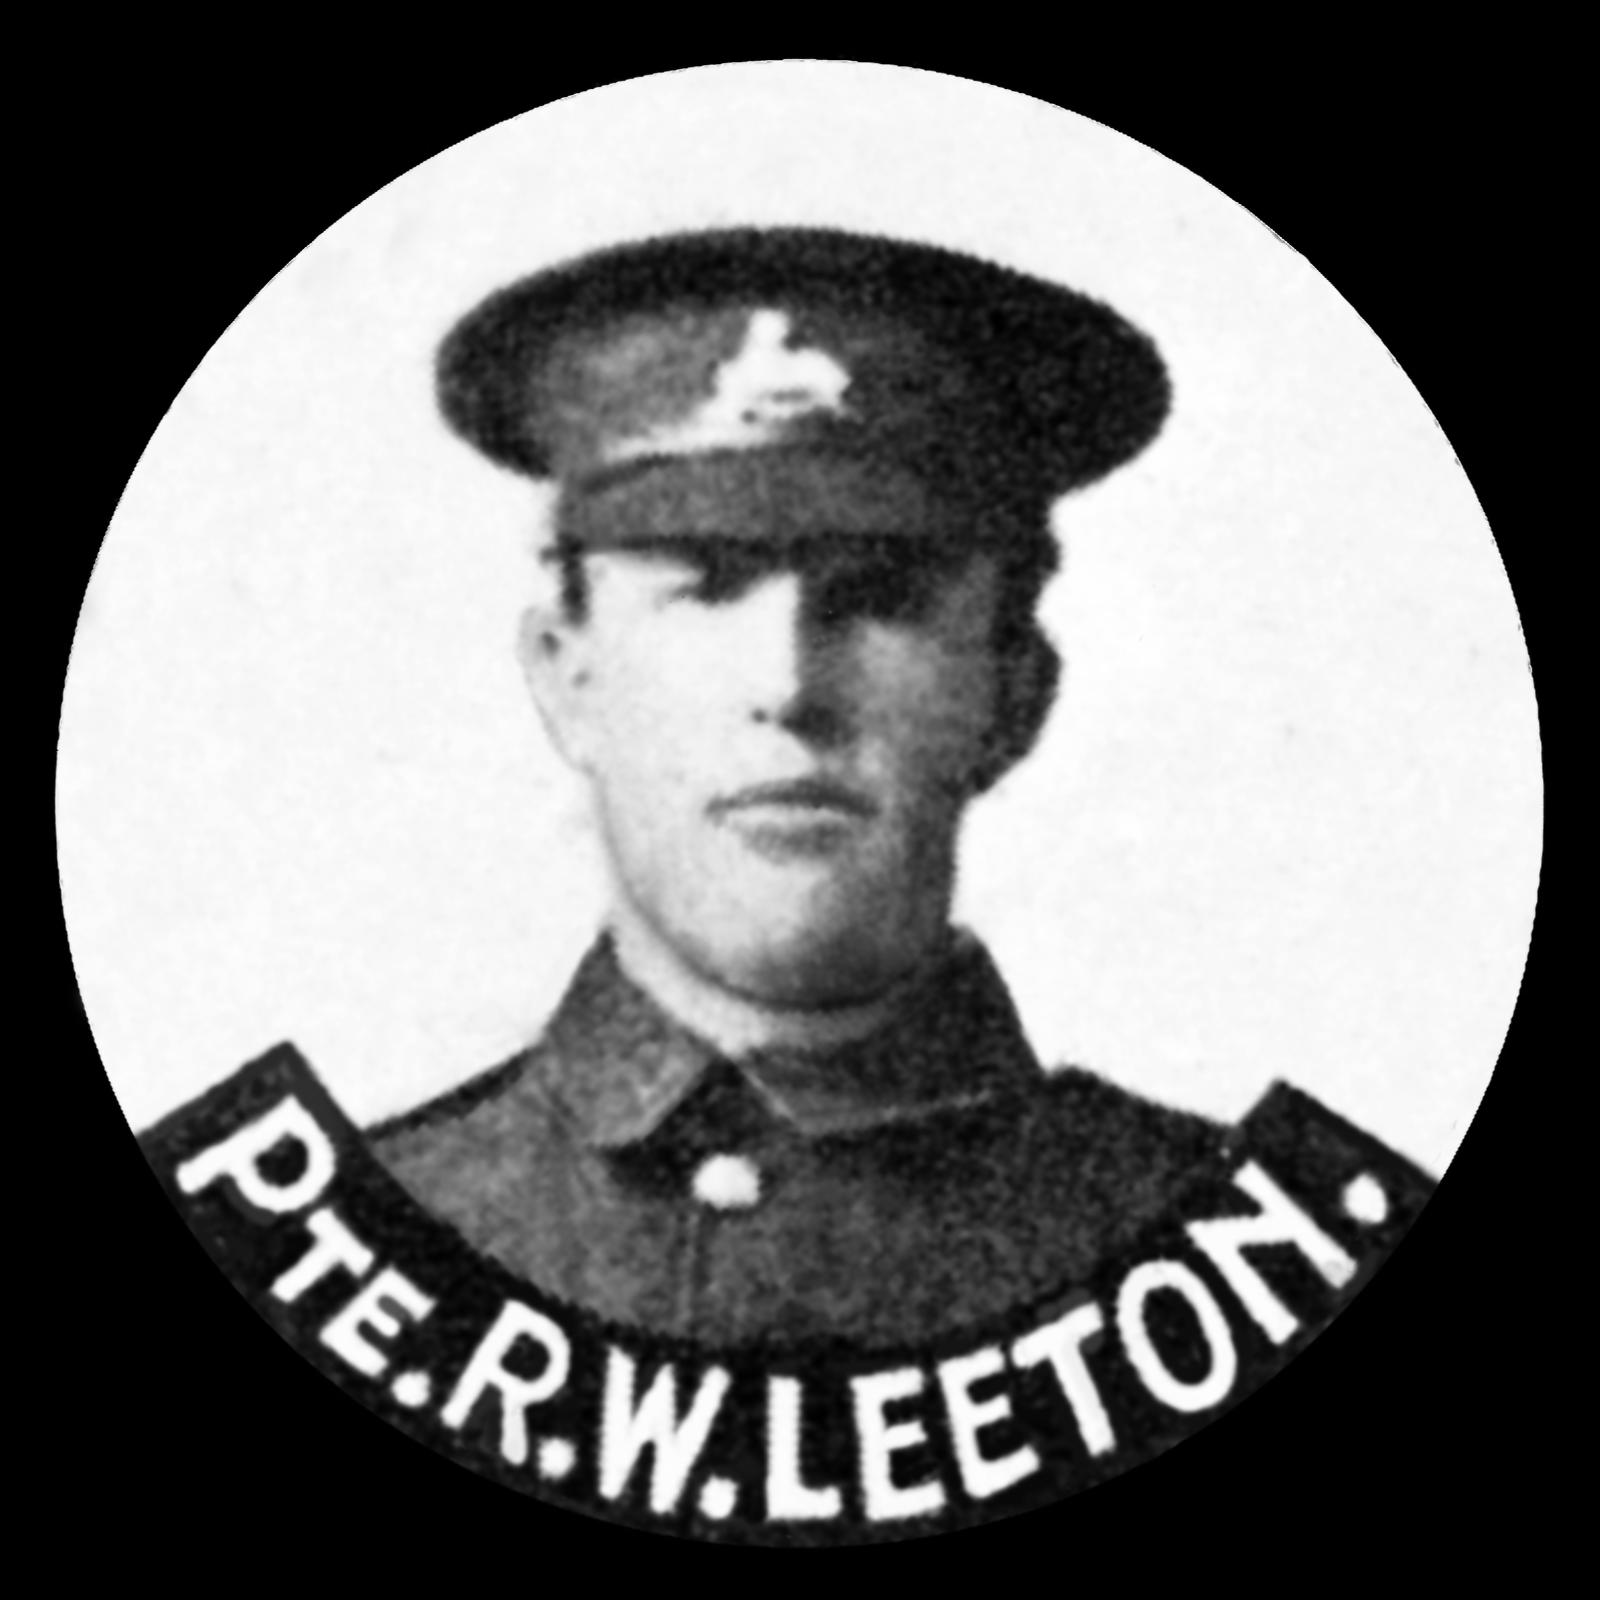 LEETON Robert Wllllam